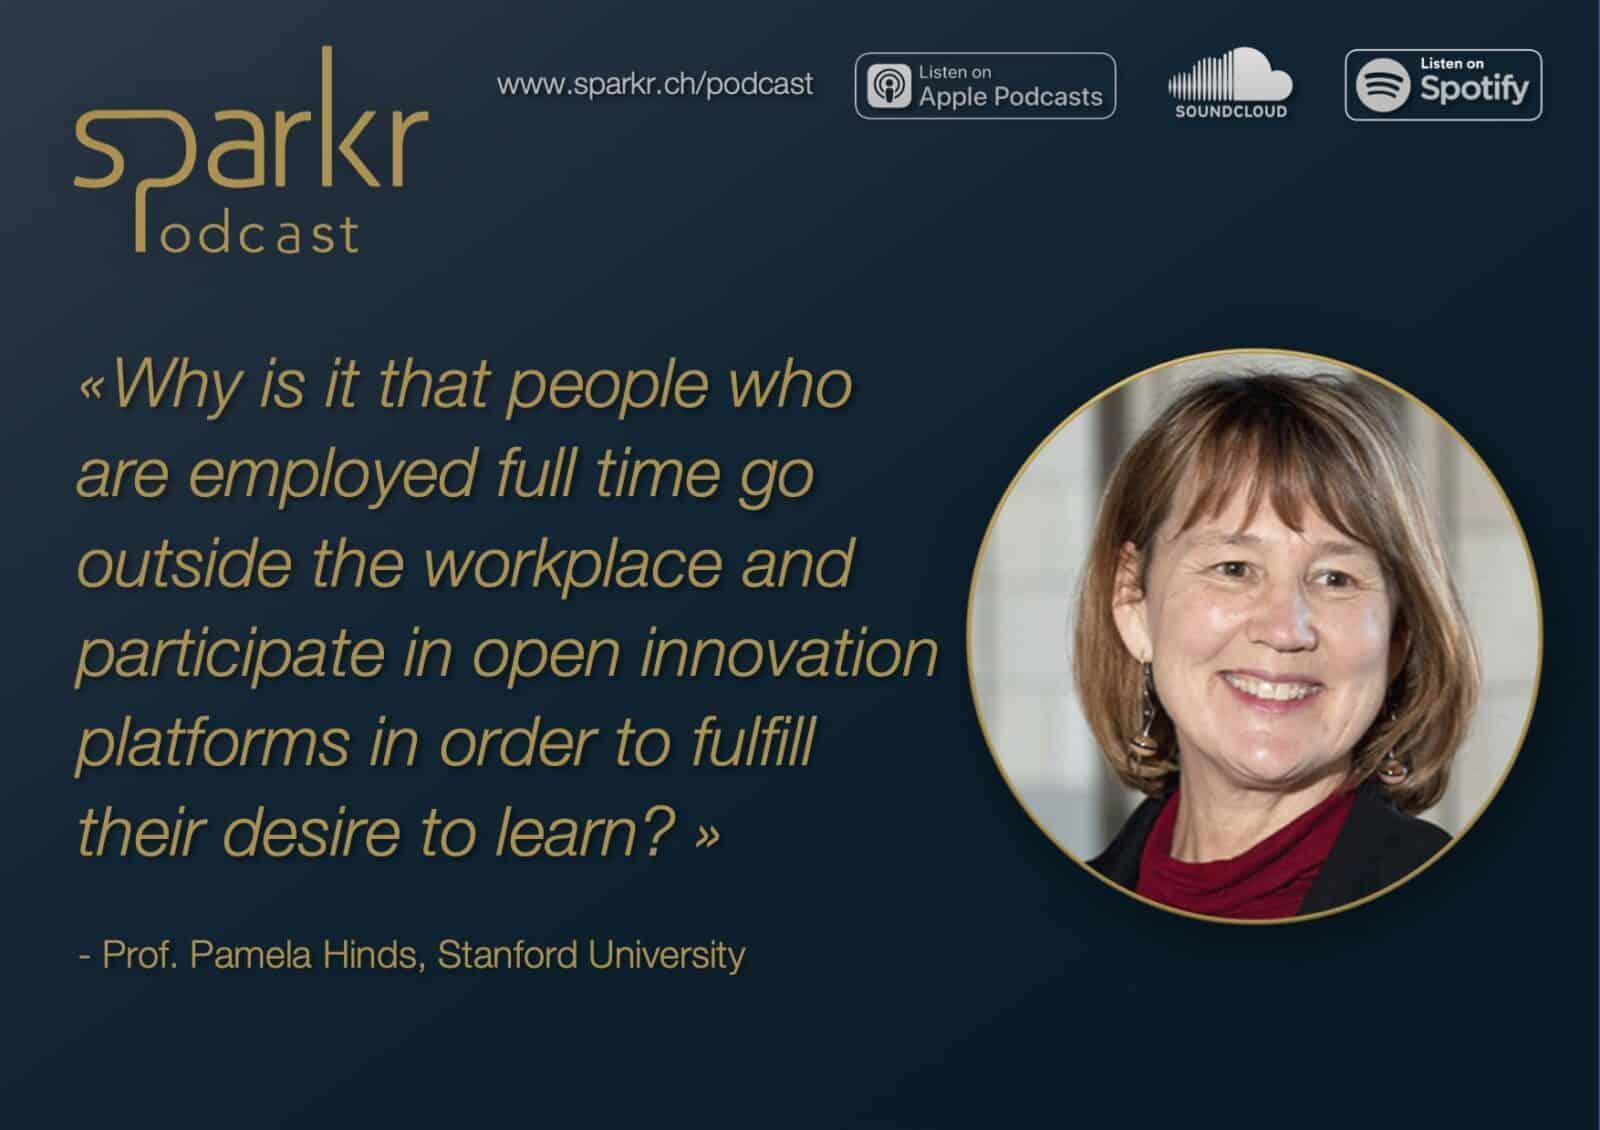 future of work best practice open innovation Pamela Hinds Sparkr Podcast